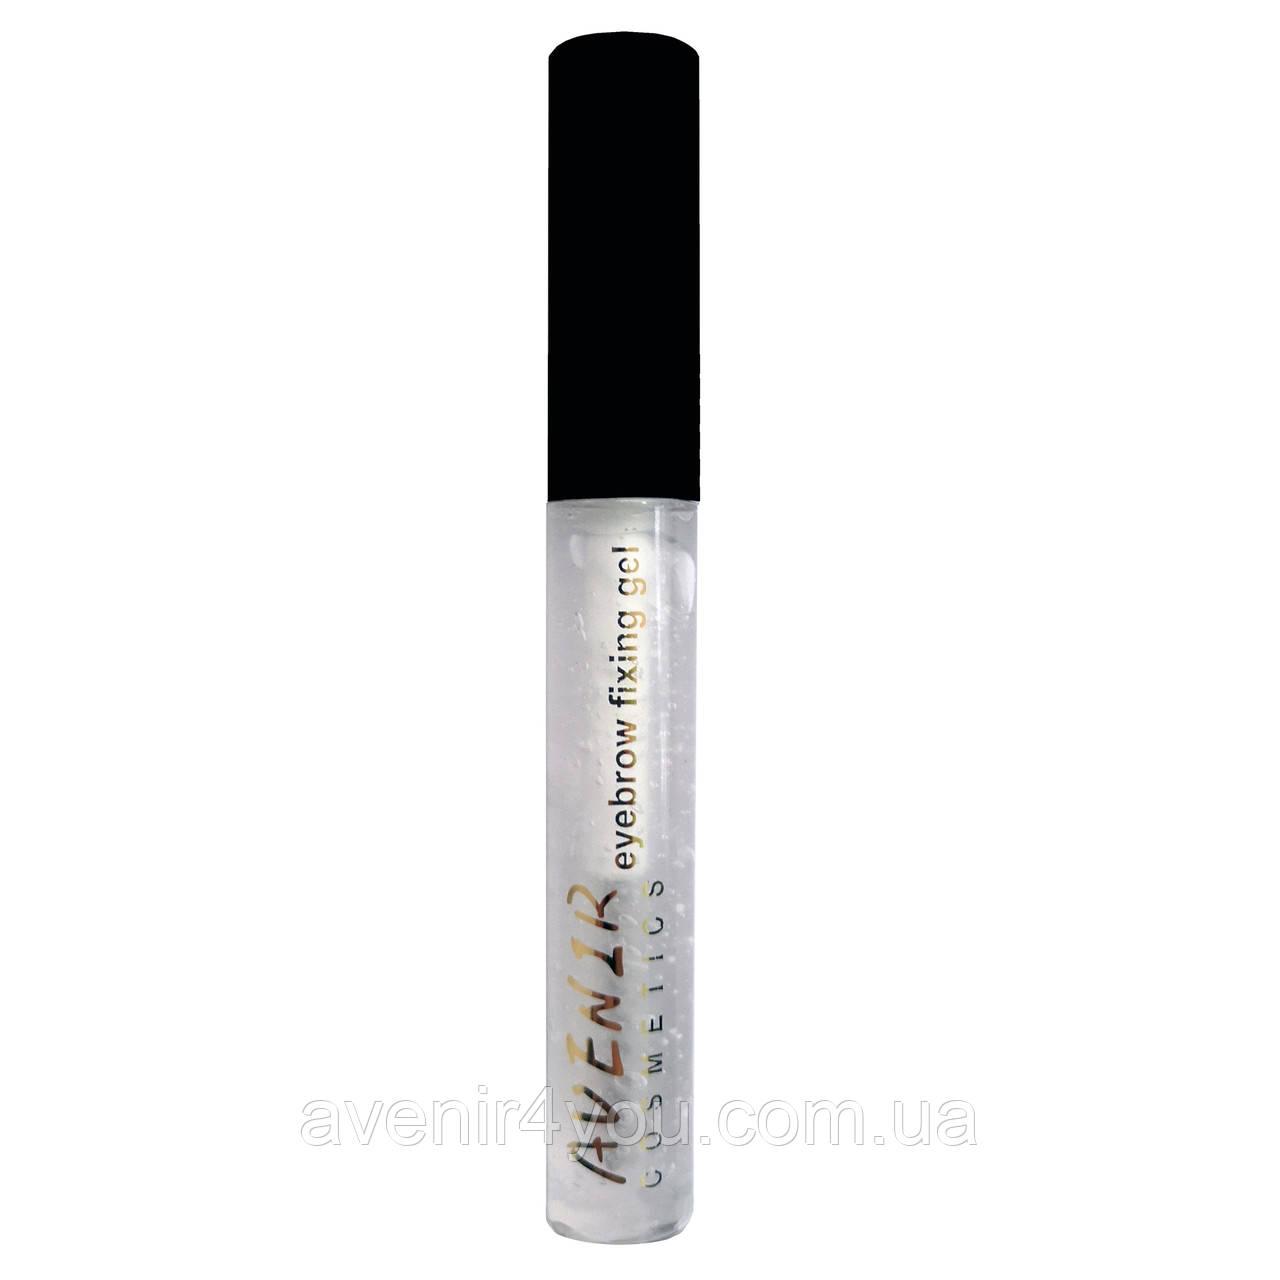 Гель для ламінації брів Avenir Cosmetics ультрафиксация 6.5 м